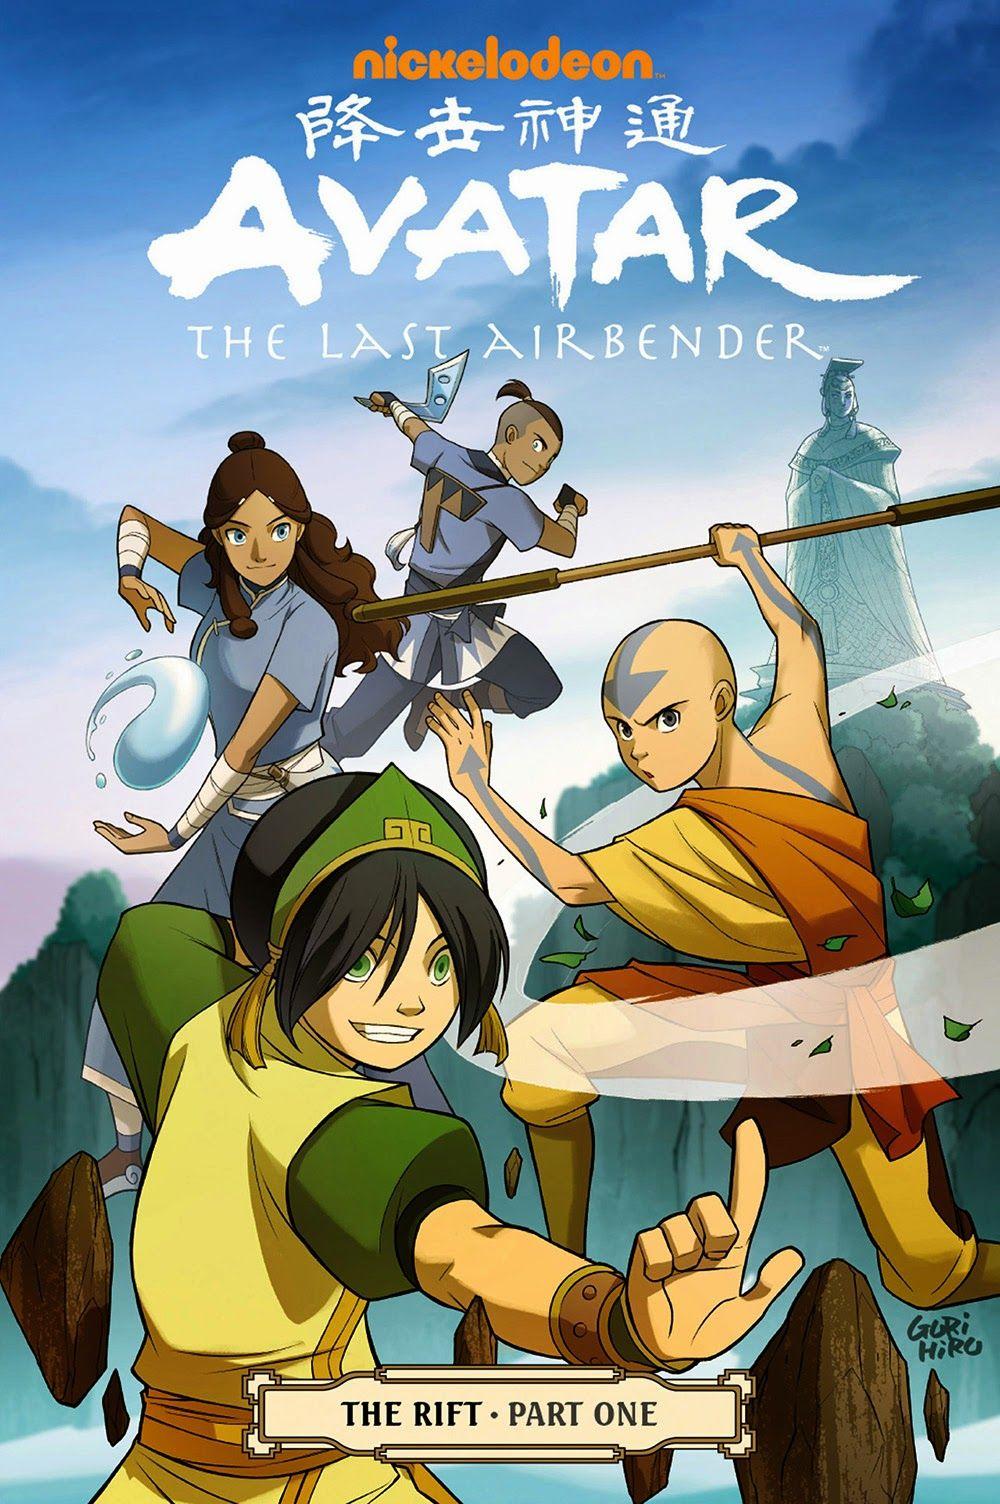 Avatar The Last Airbender The Rift Part 1 2014 Viewcomic Reading Comics Avatar El Ultimo Maestro Aire Avatar La Leyenda De Aang Personajes De Avatar